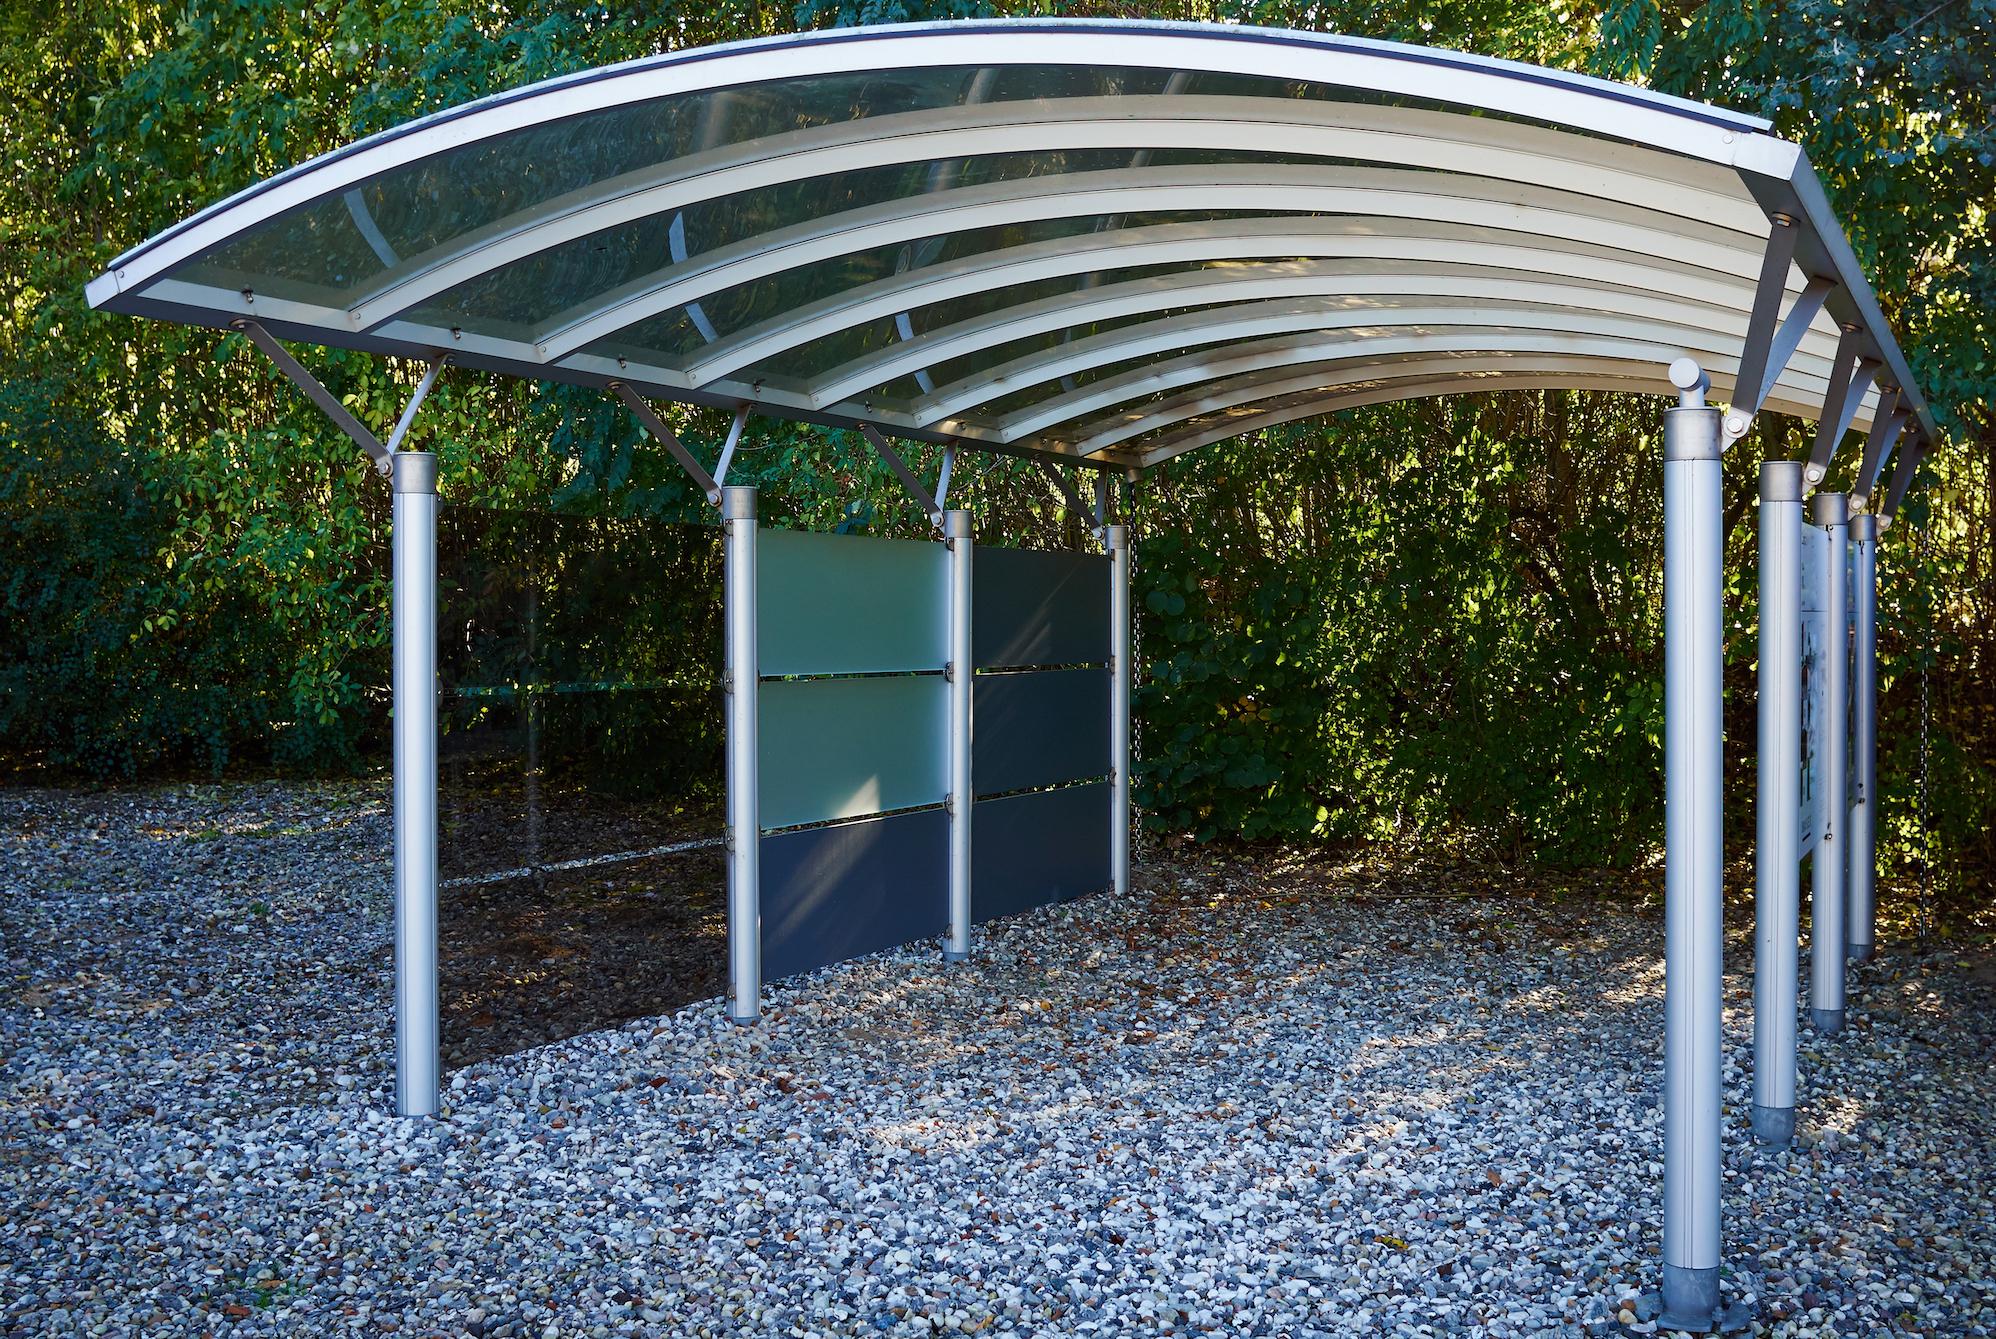 Modern metal carport car garage parking made of silver metal and glass